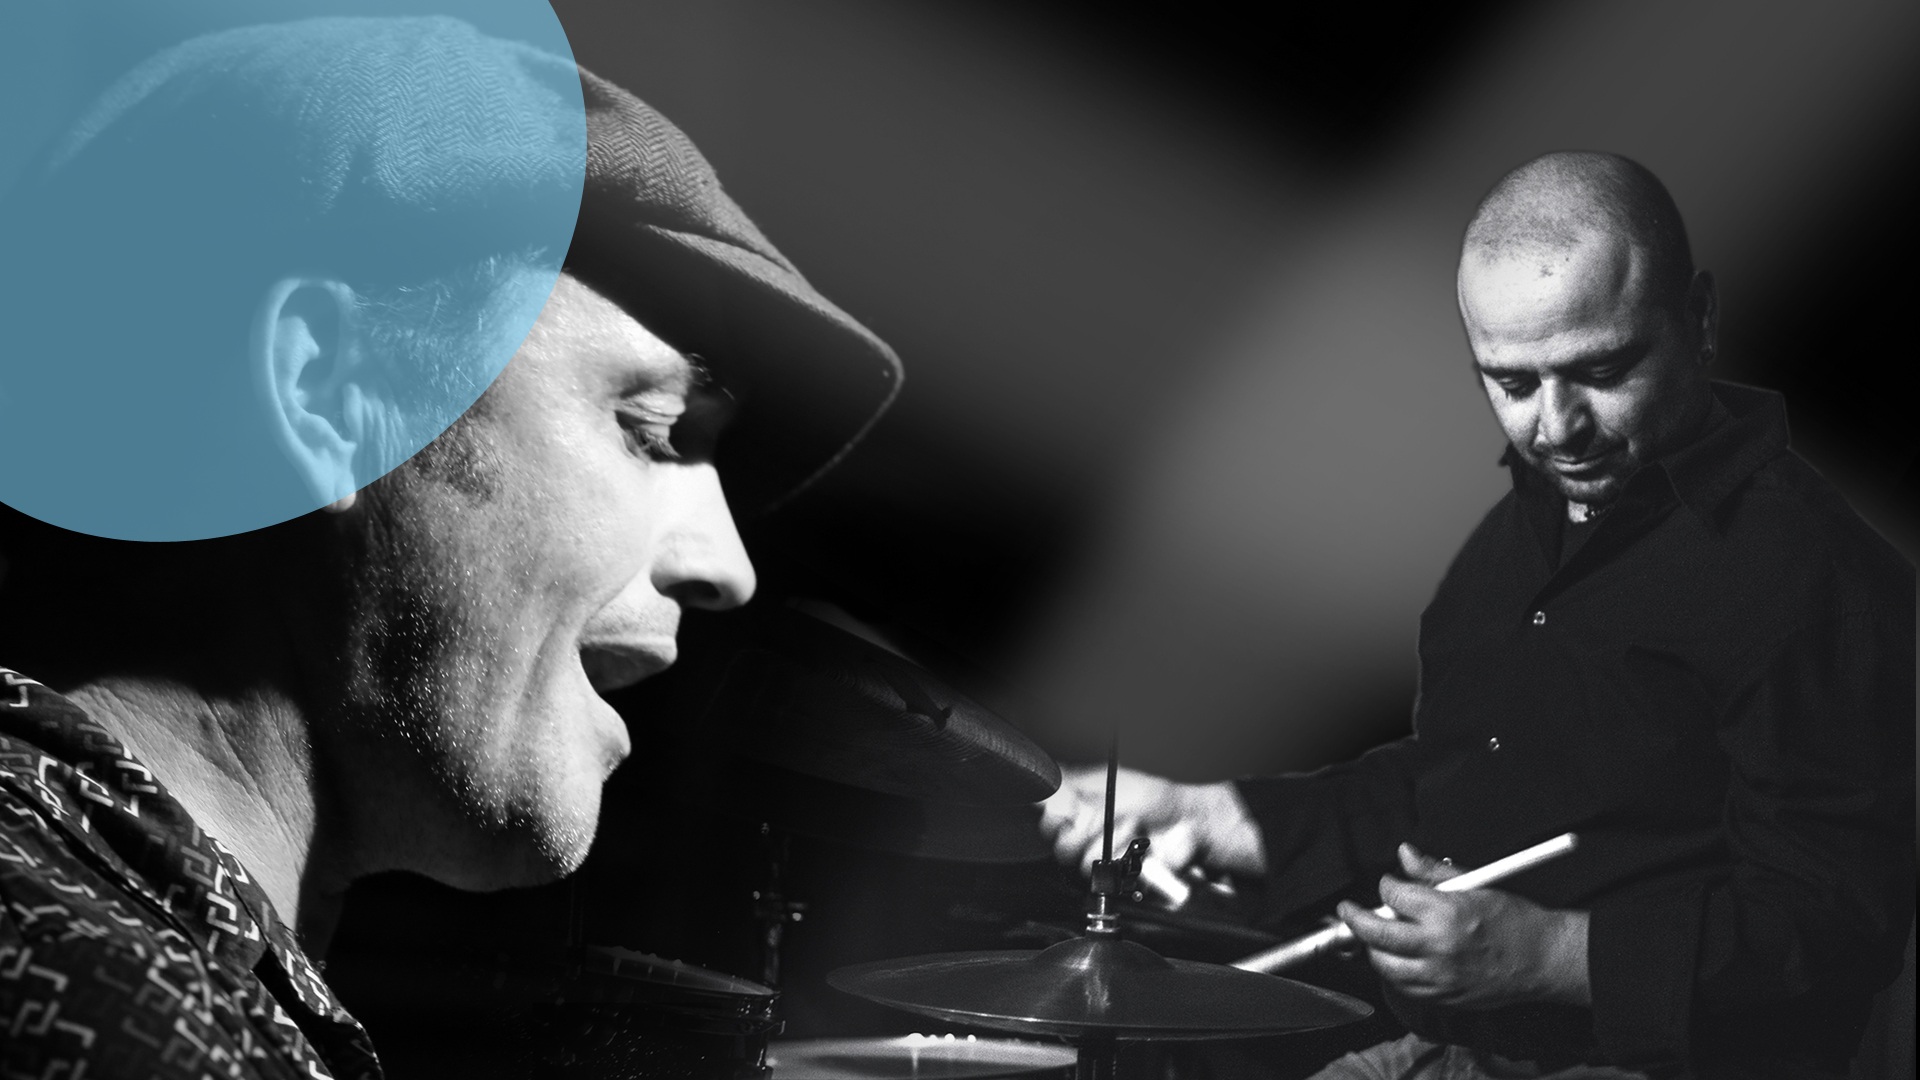 12.01. :: BONN | Dottendorfer Jazznacht:: the soul of jazz :: YASSMO' featuring ANTONIO FUSCO, DANH THAI & IGOR LAZAREV